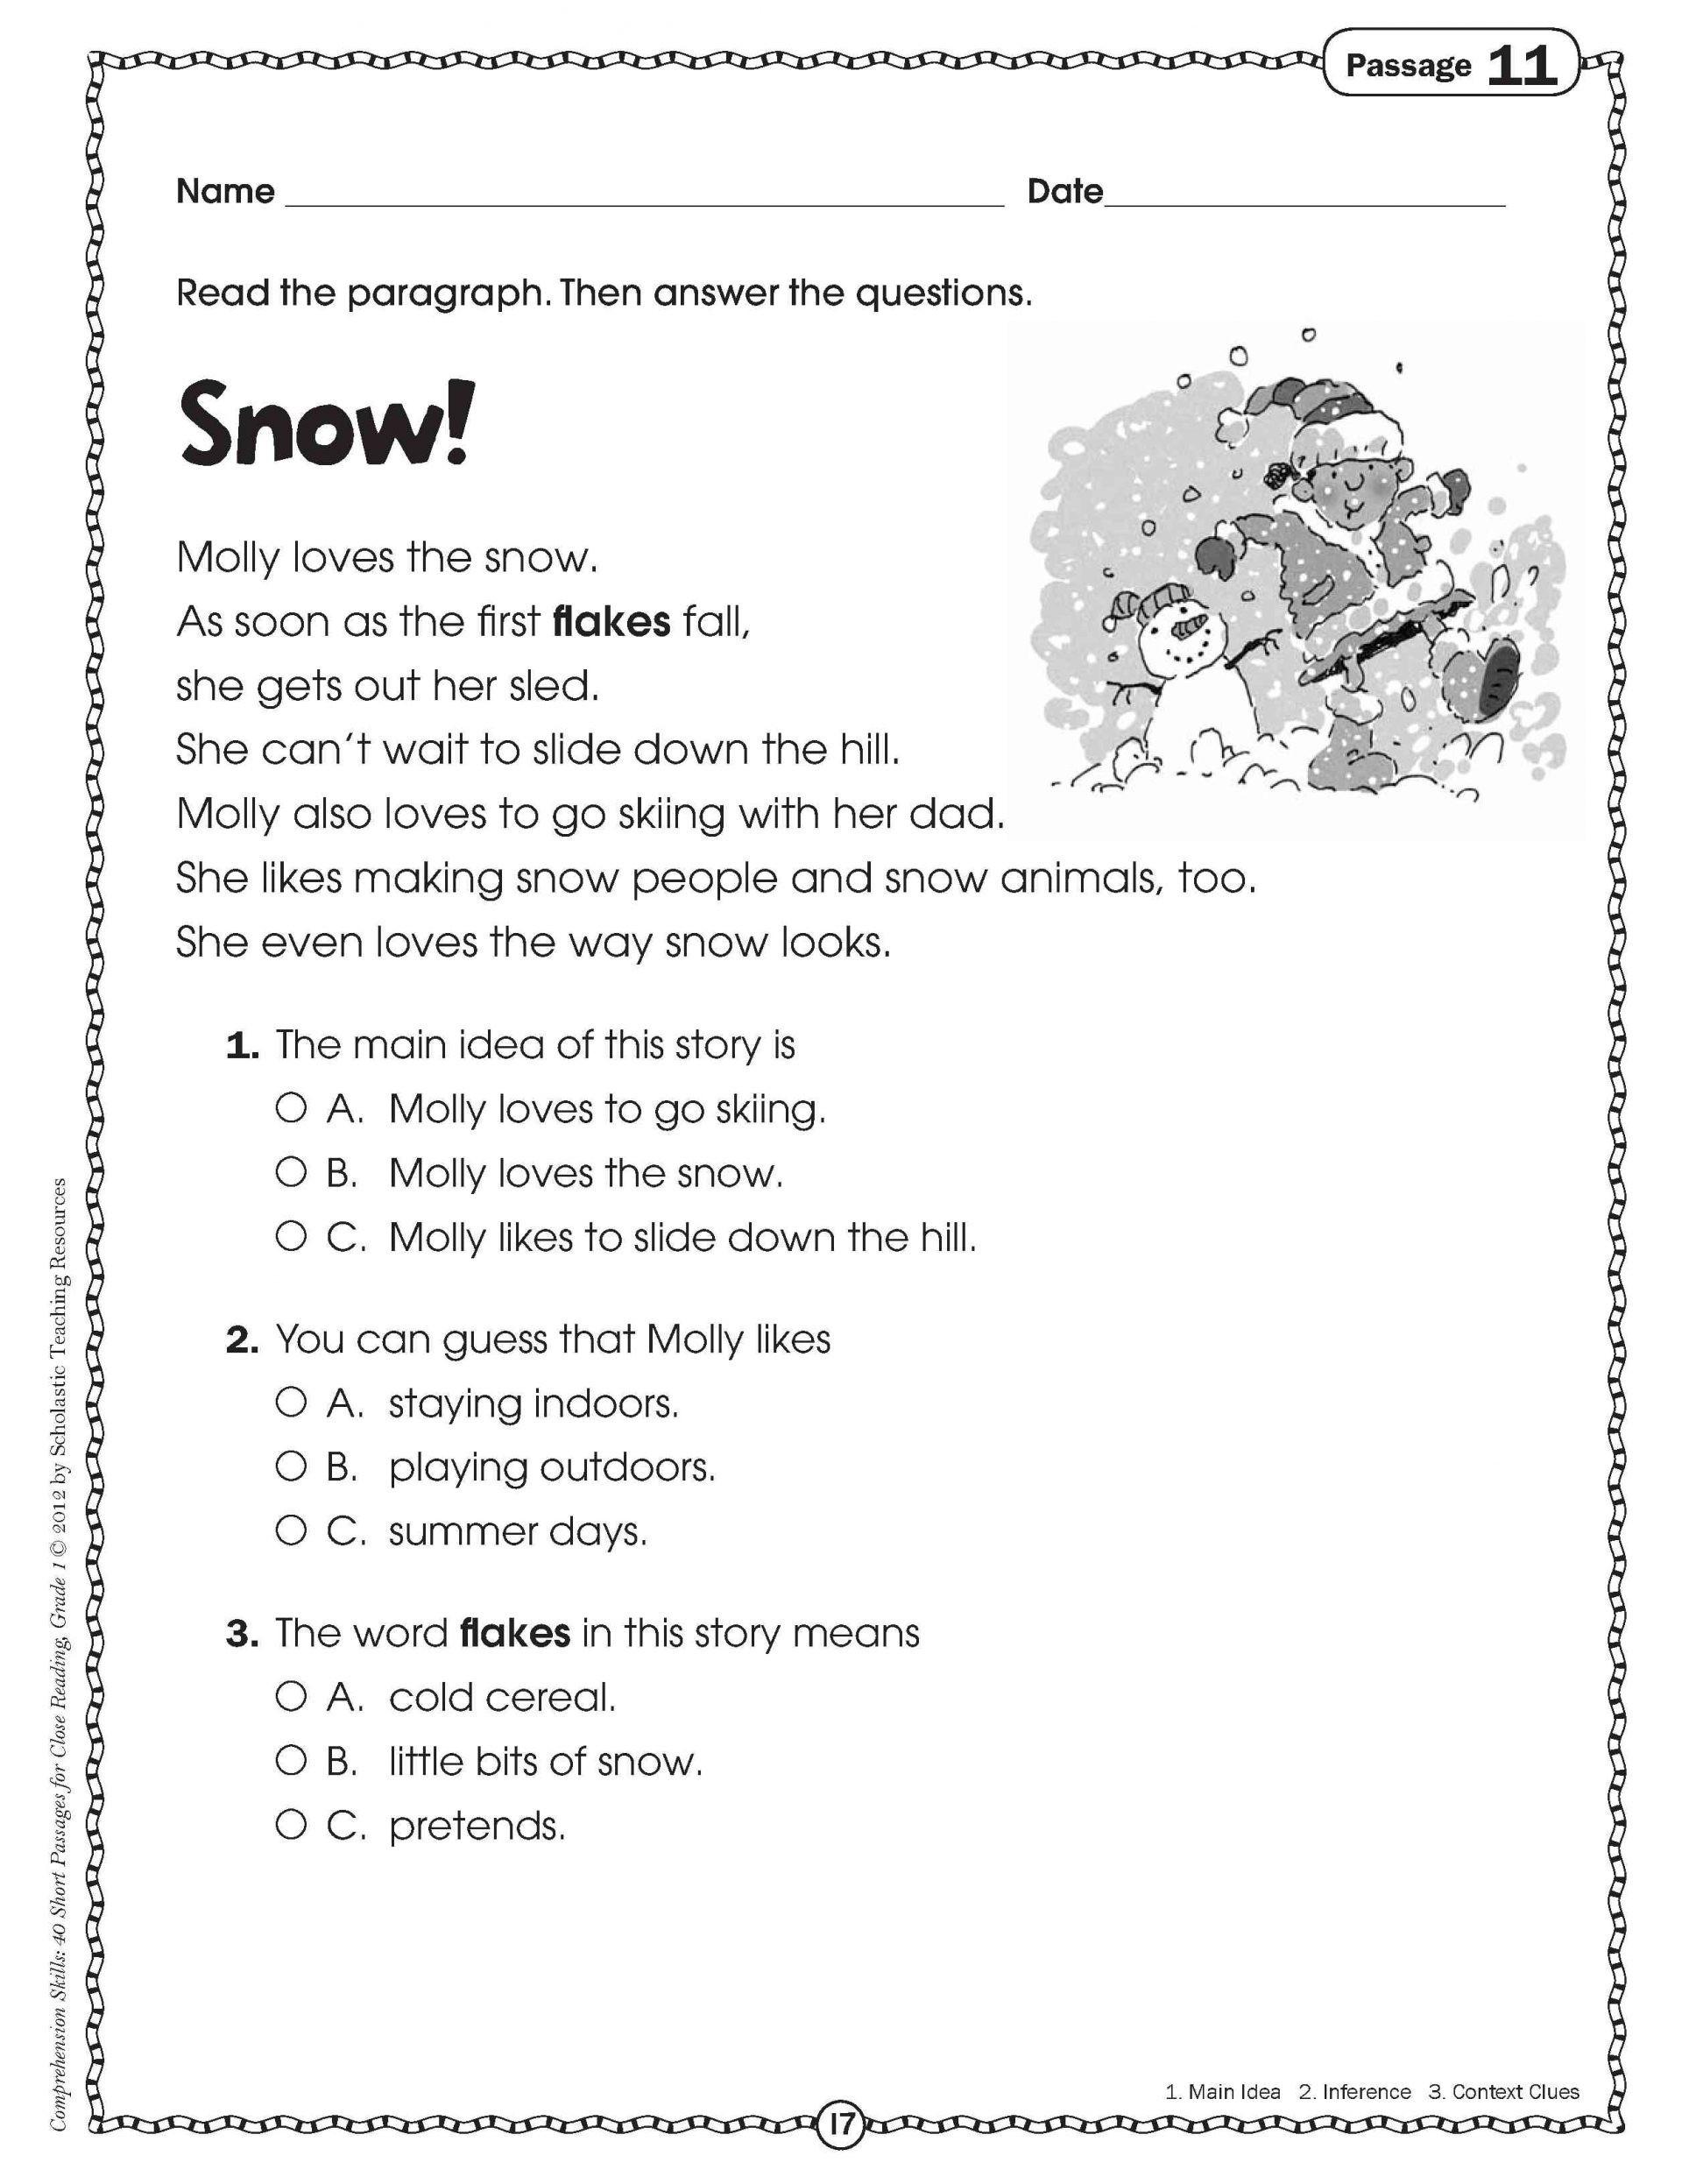 Free Printable Reading Comprehension Worksheets 3Rd Grade To - Free Printable Grade 1 Reading Comprehension Worksheets